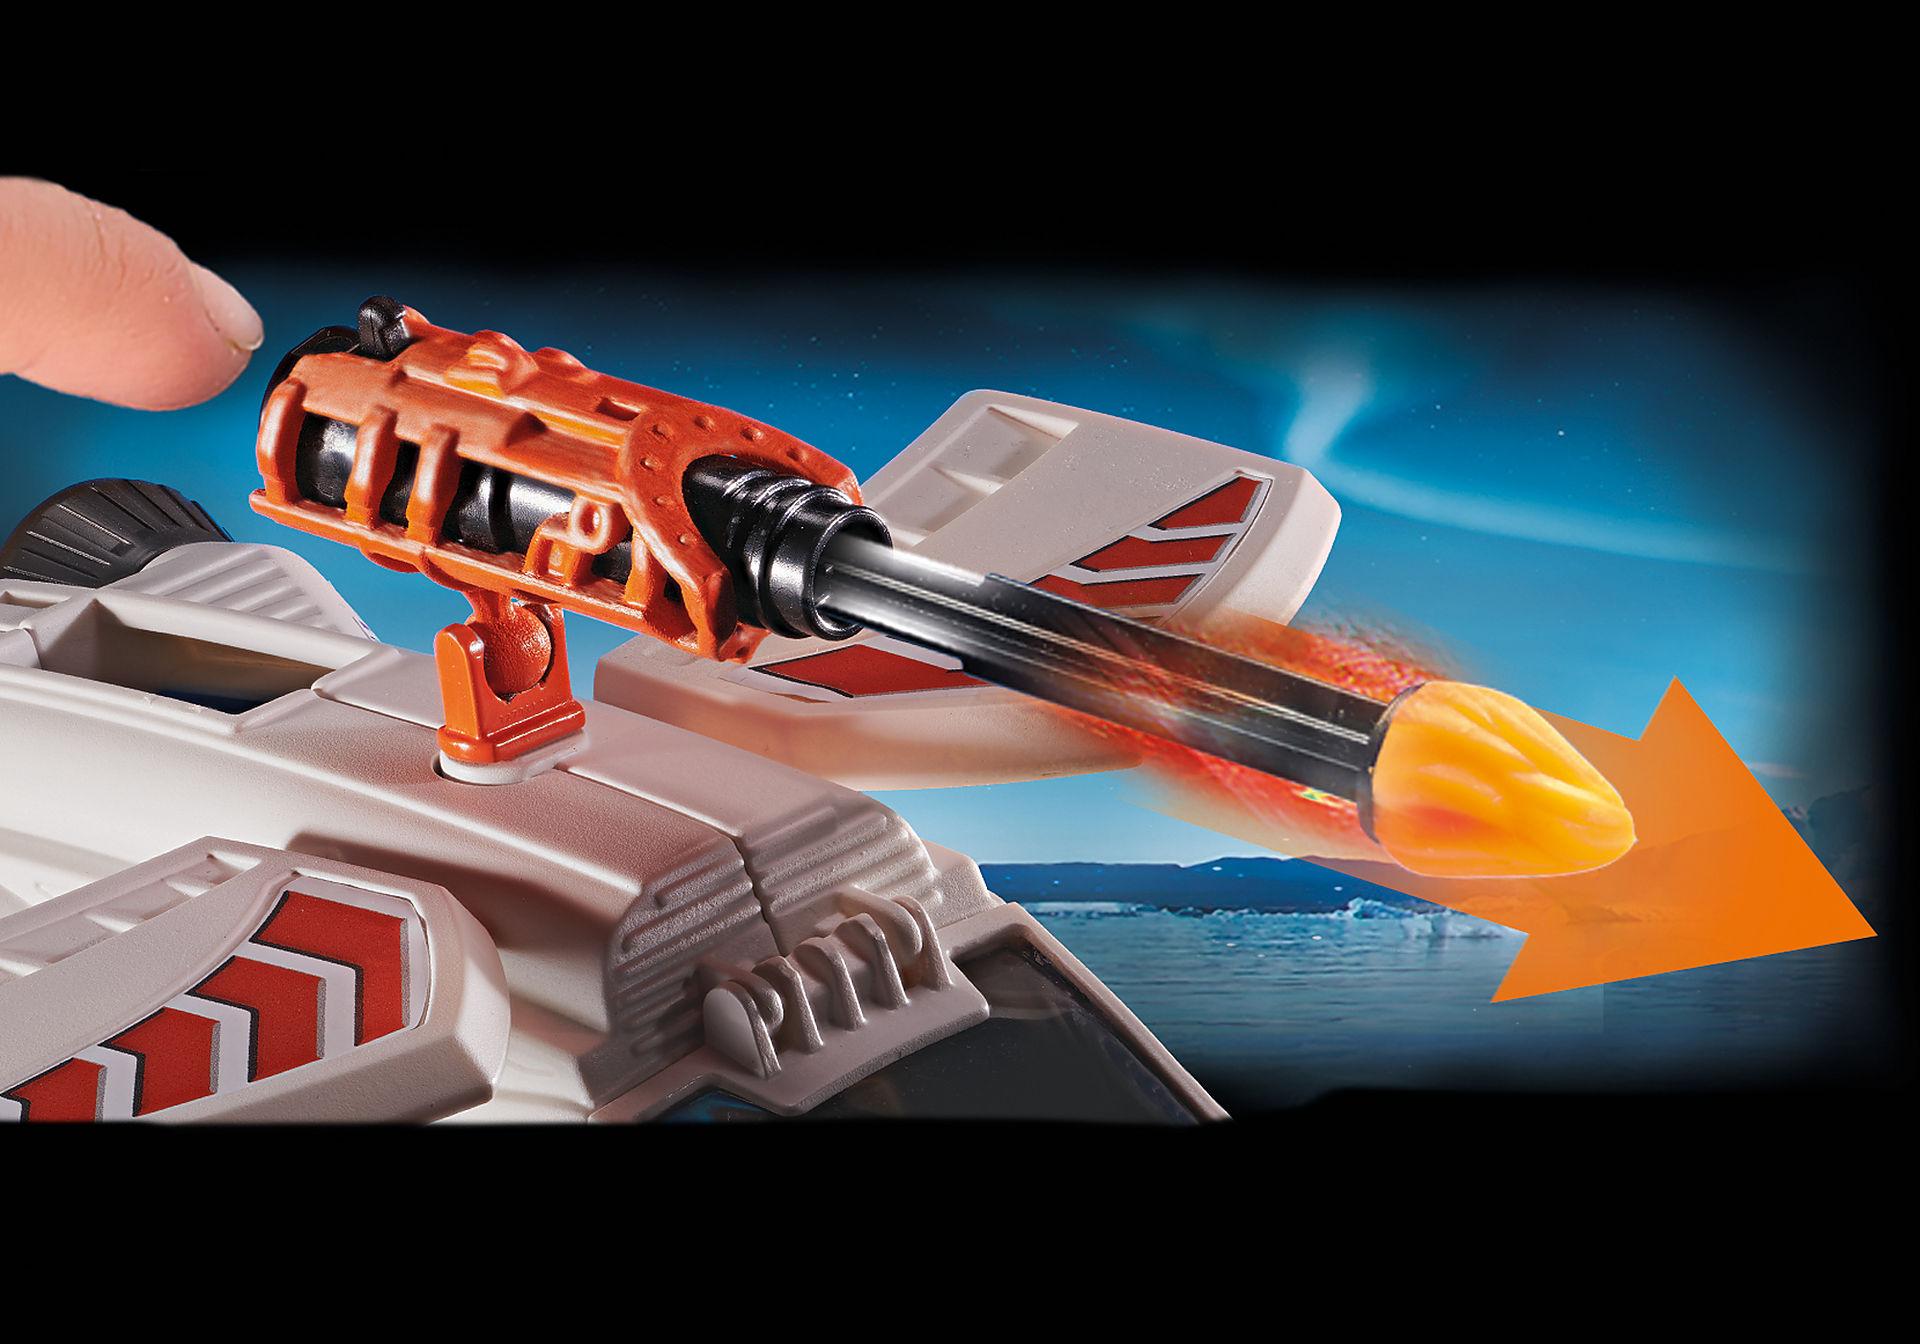 70231 Spy Team Snow Glider zoom image6